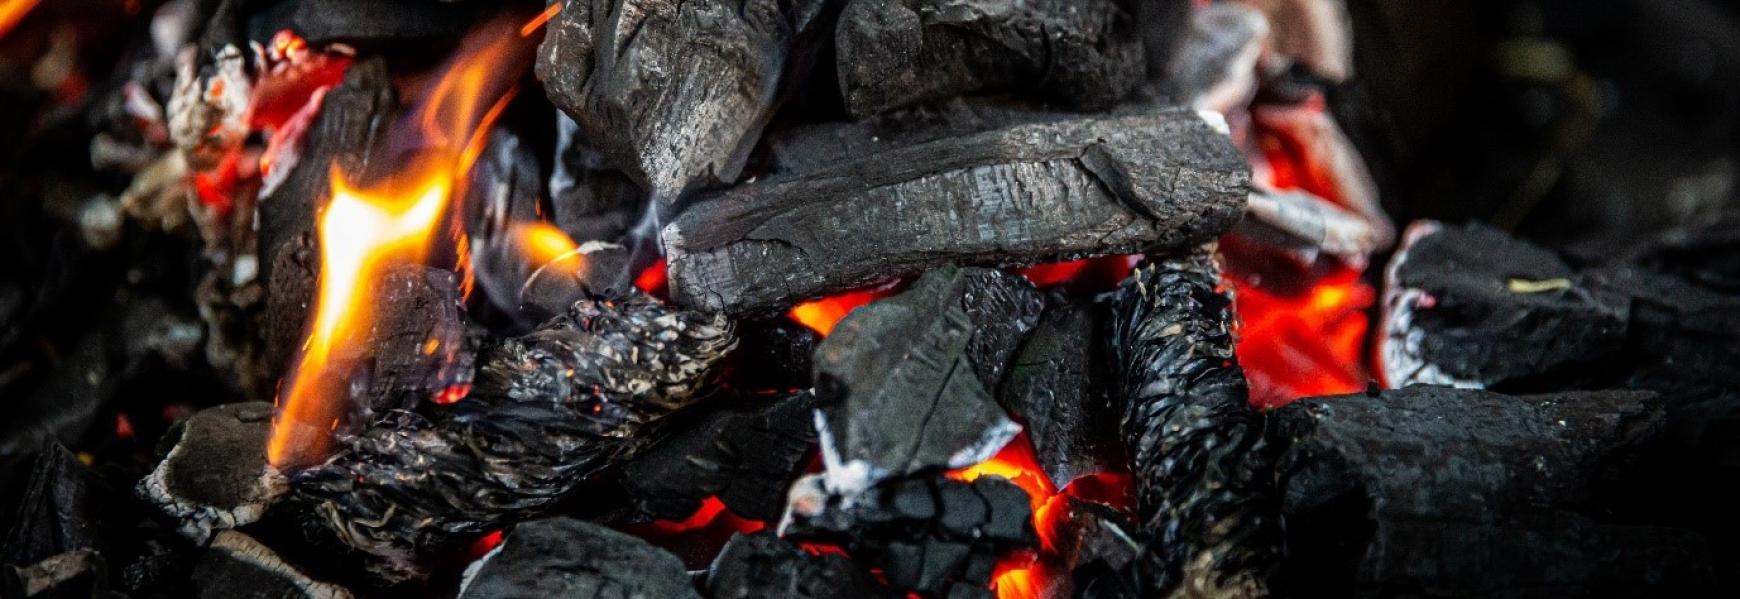 Close up of burning coals